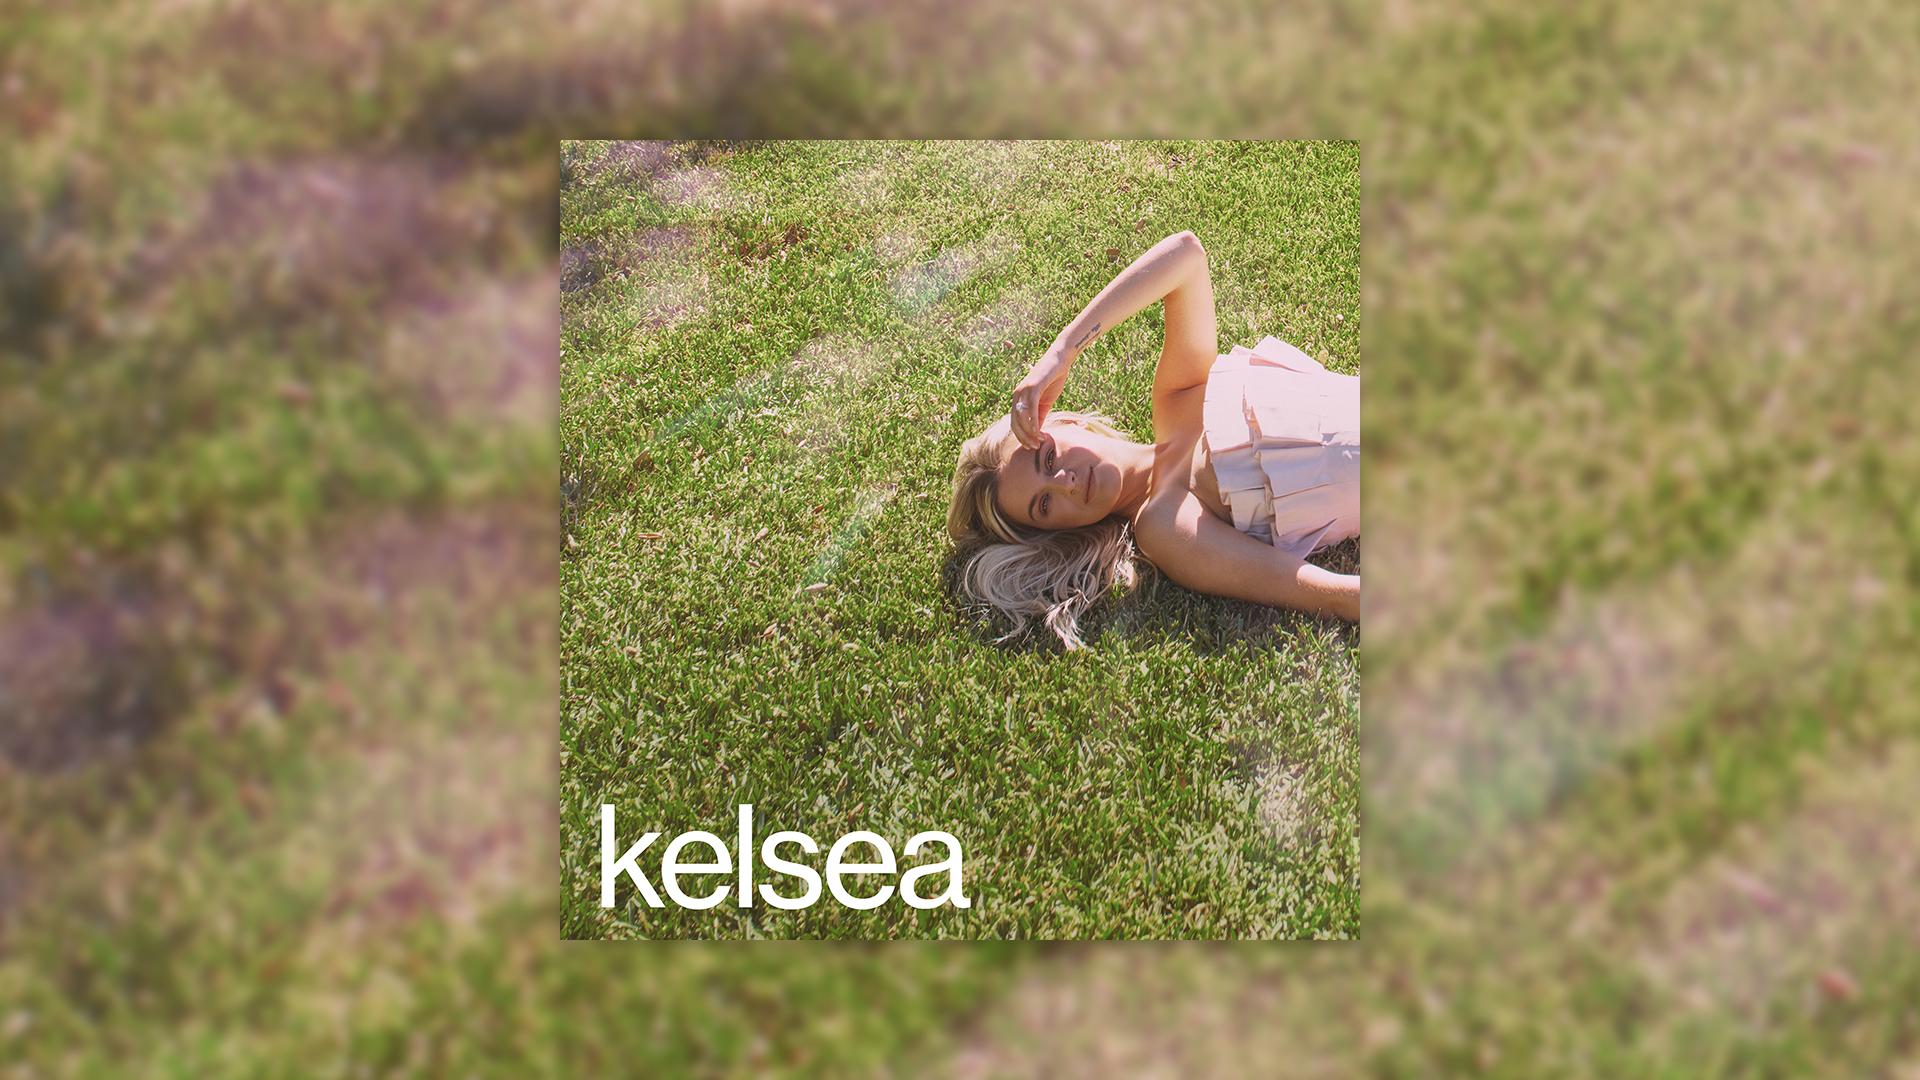 KELSEA BALLERINI kelsea | new album available 3.20